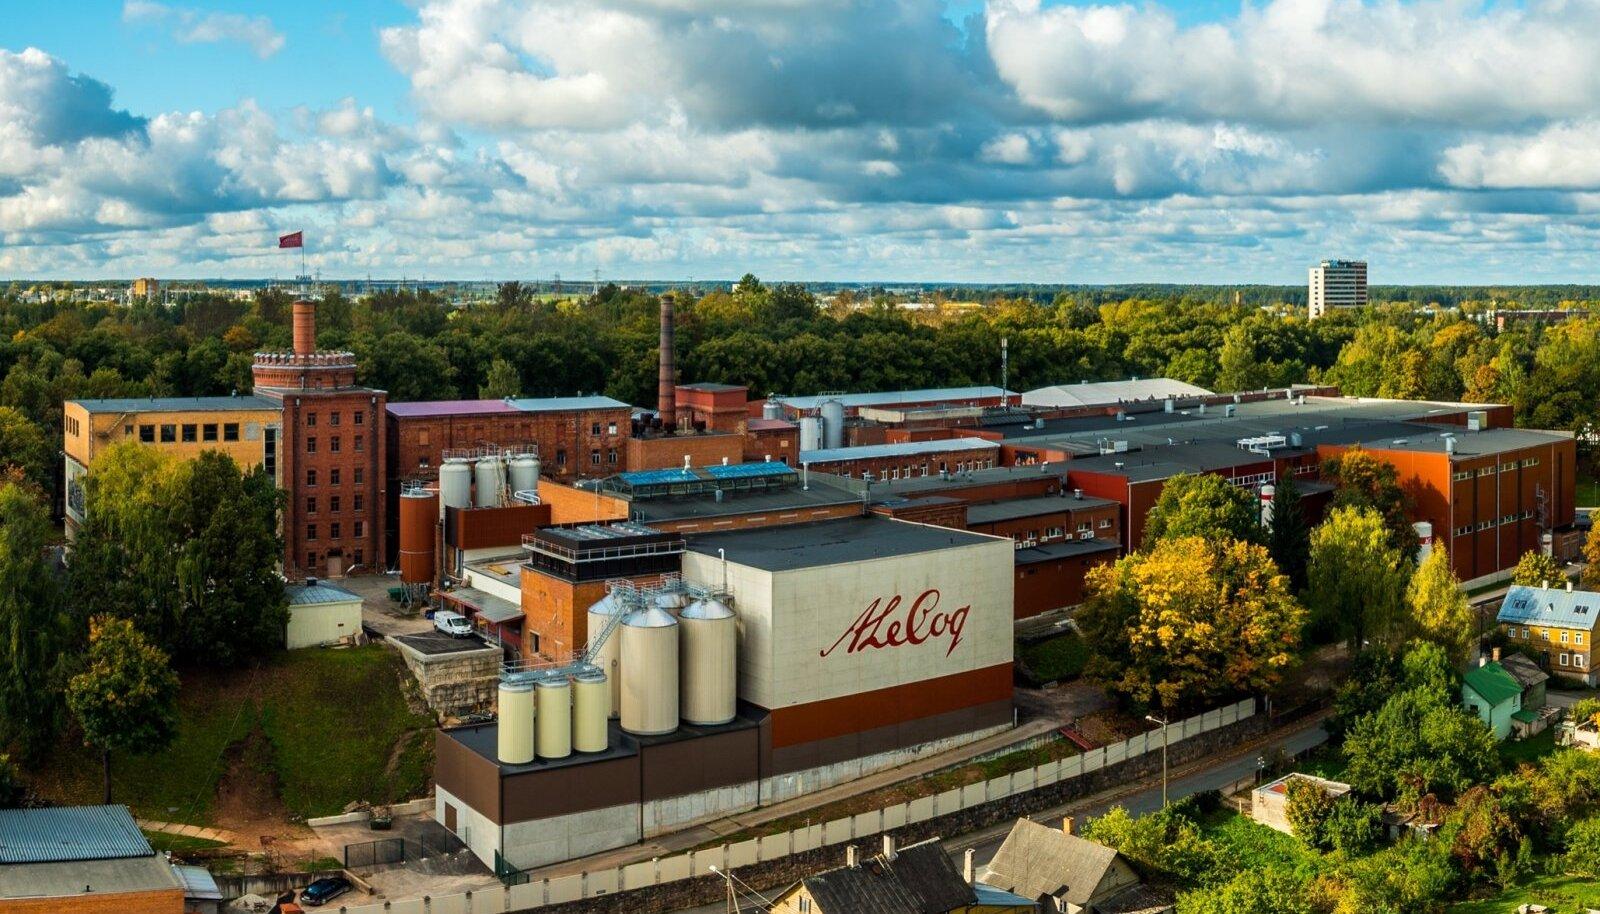 Vaade A. Le Coqi tehasele Supilinna poolt septembris 2015.